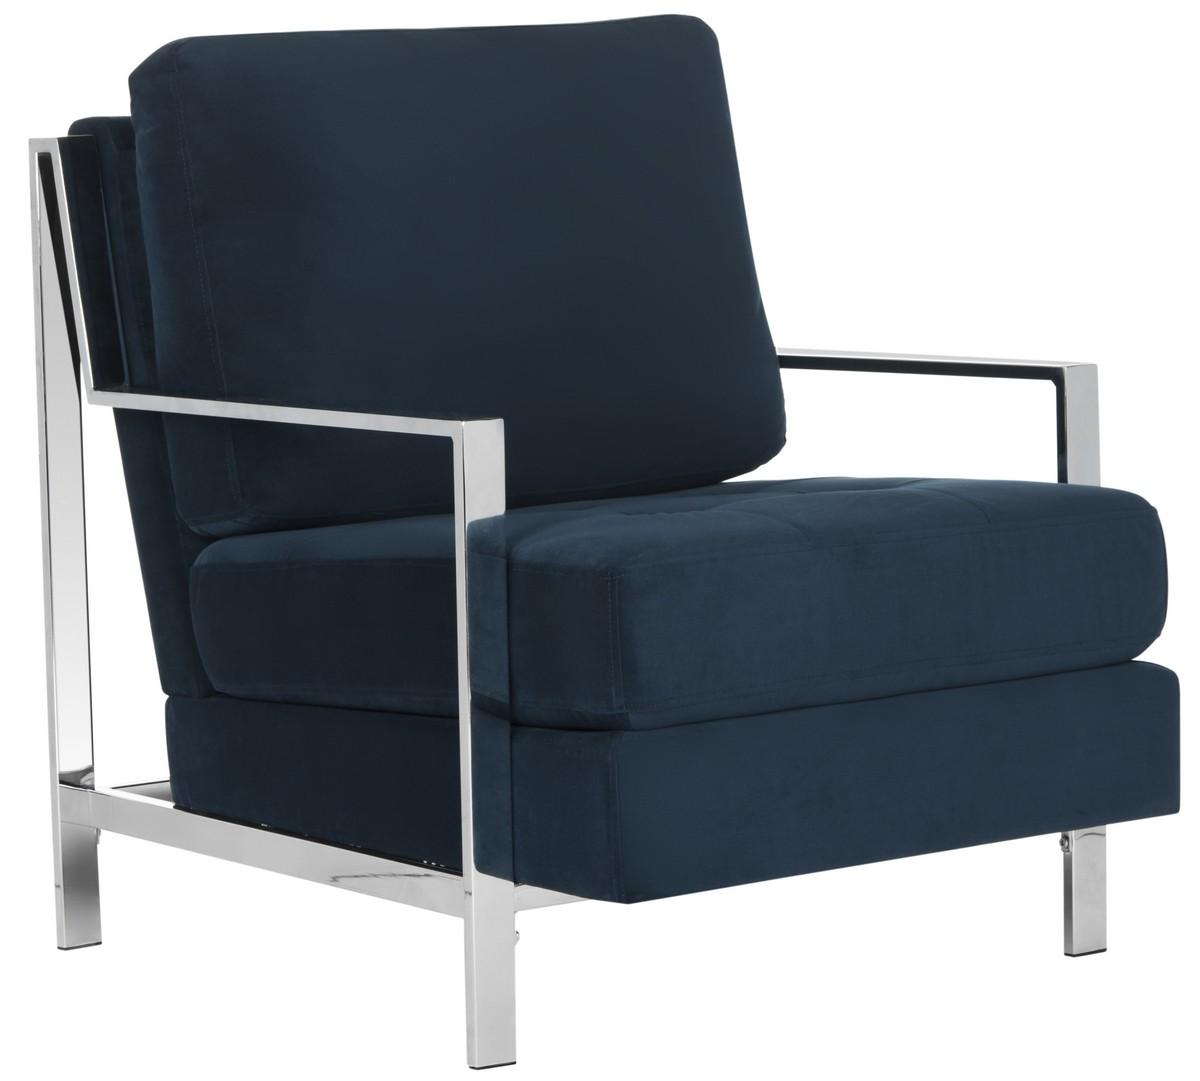 Fine Fox6279B Accent Chairs Furniture By Safavieh Creativecarmelina Interior Chair Design Creativecarmelinacom